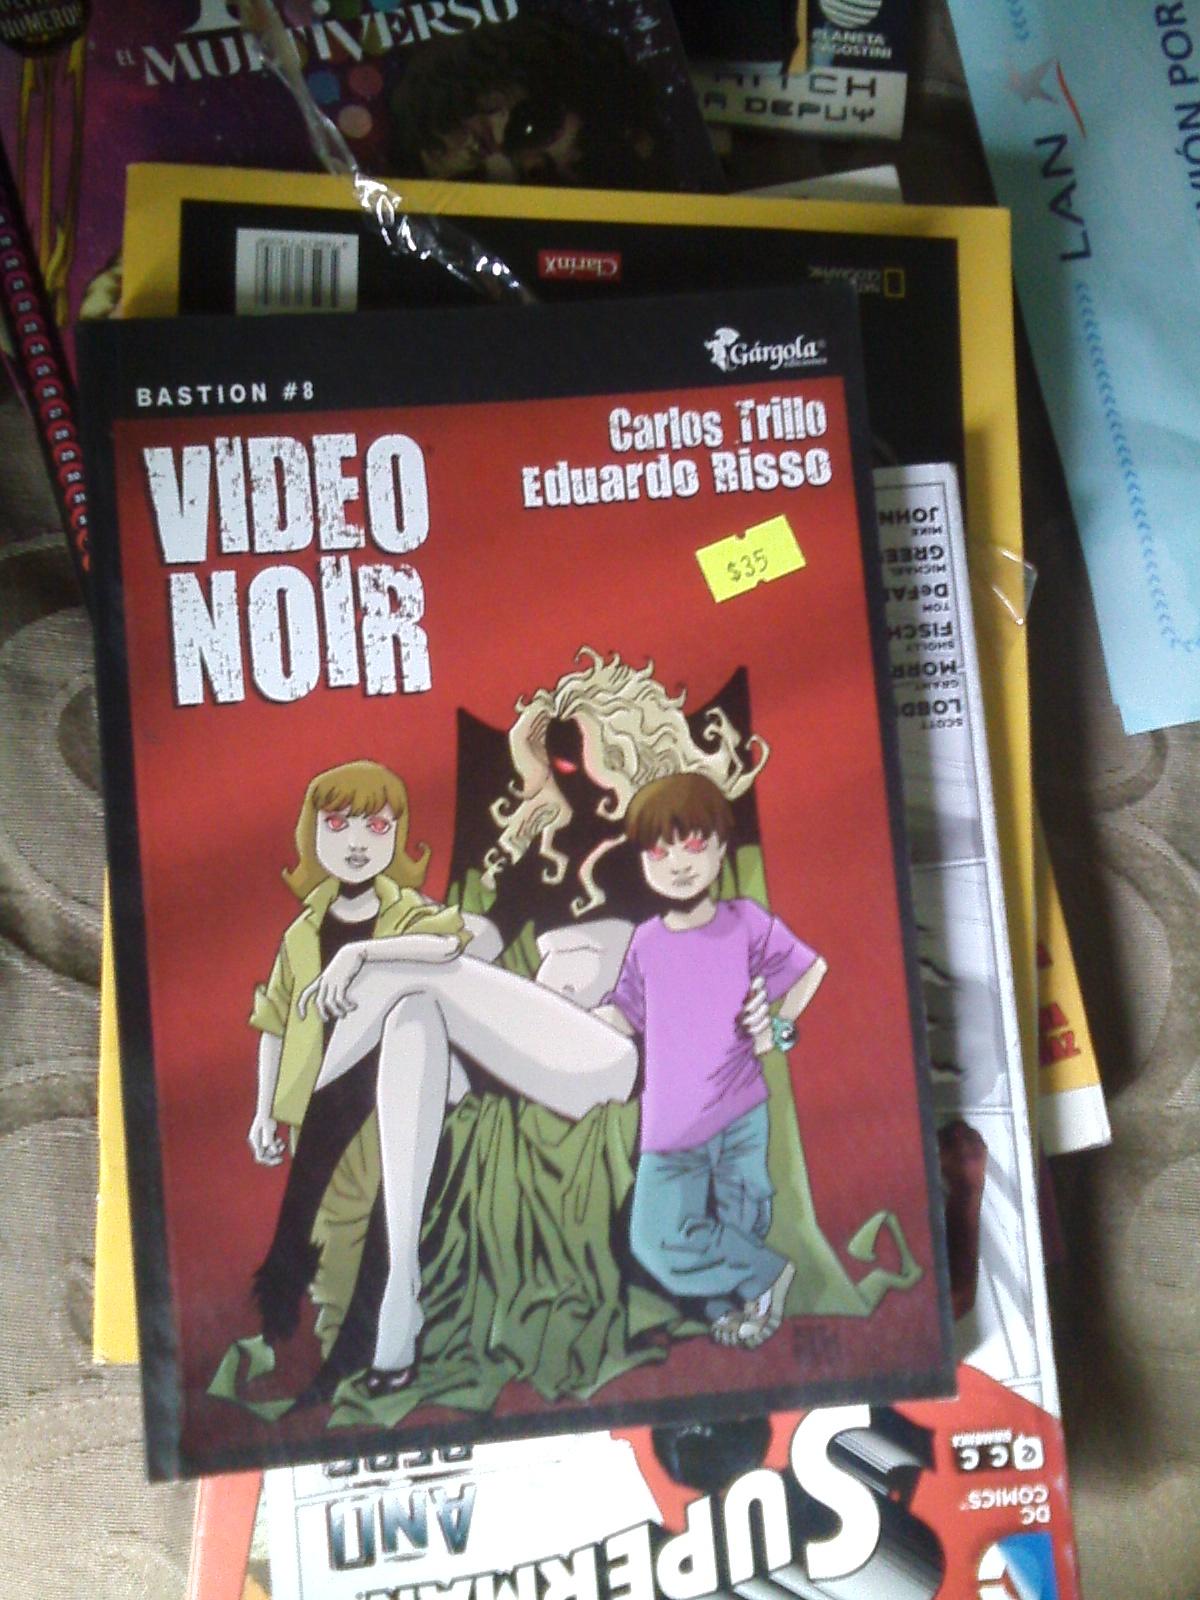 [Comics] Siguen las adquisiciones 2015 - Página 9 CAM05291